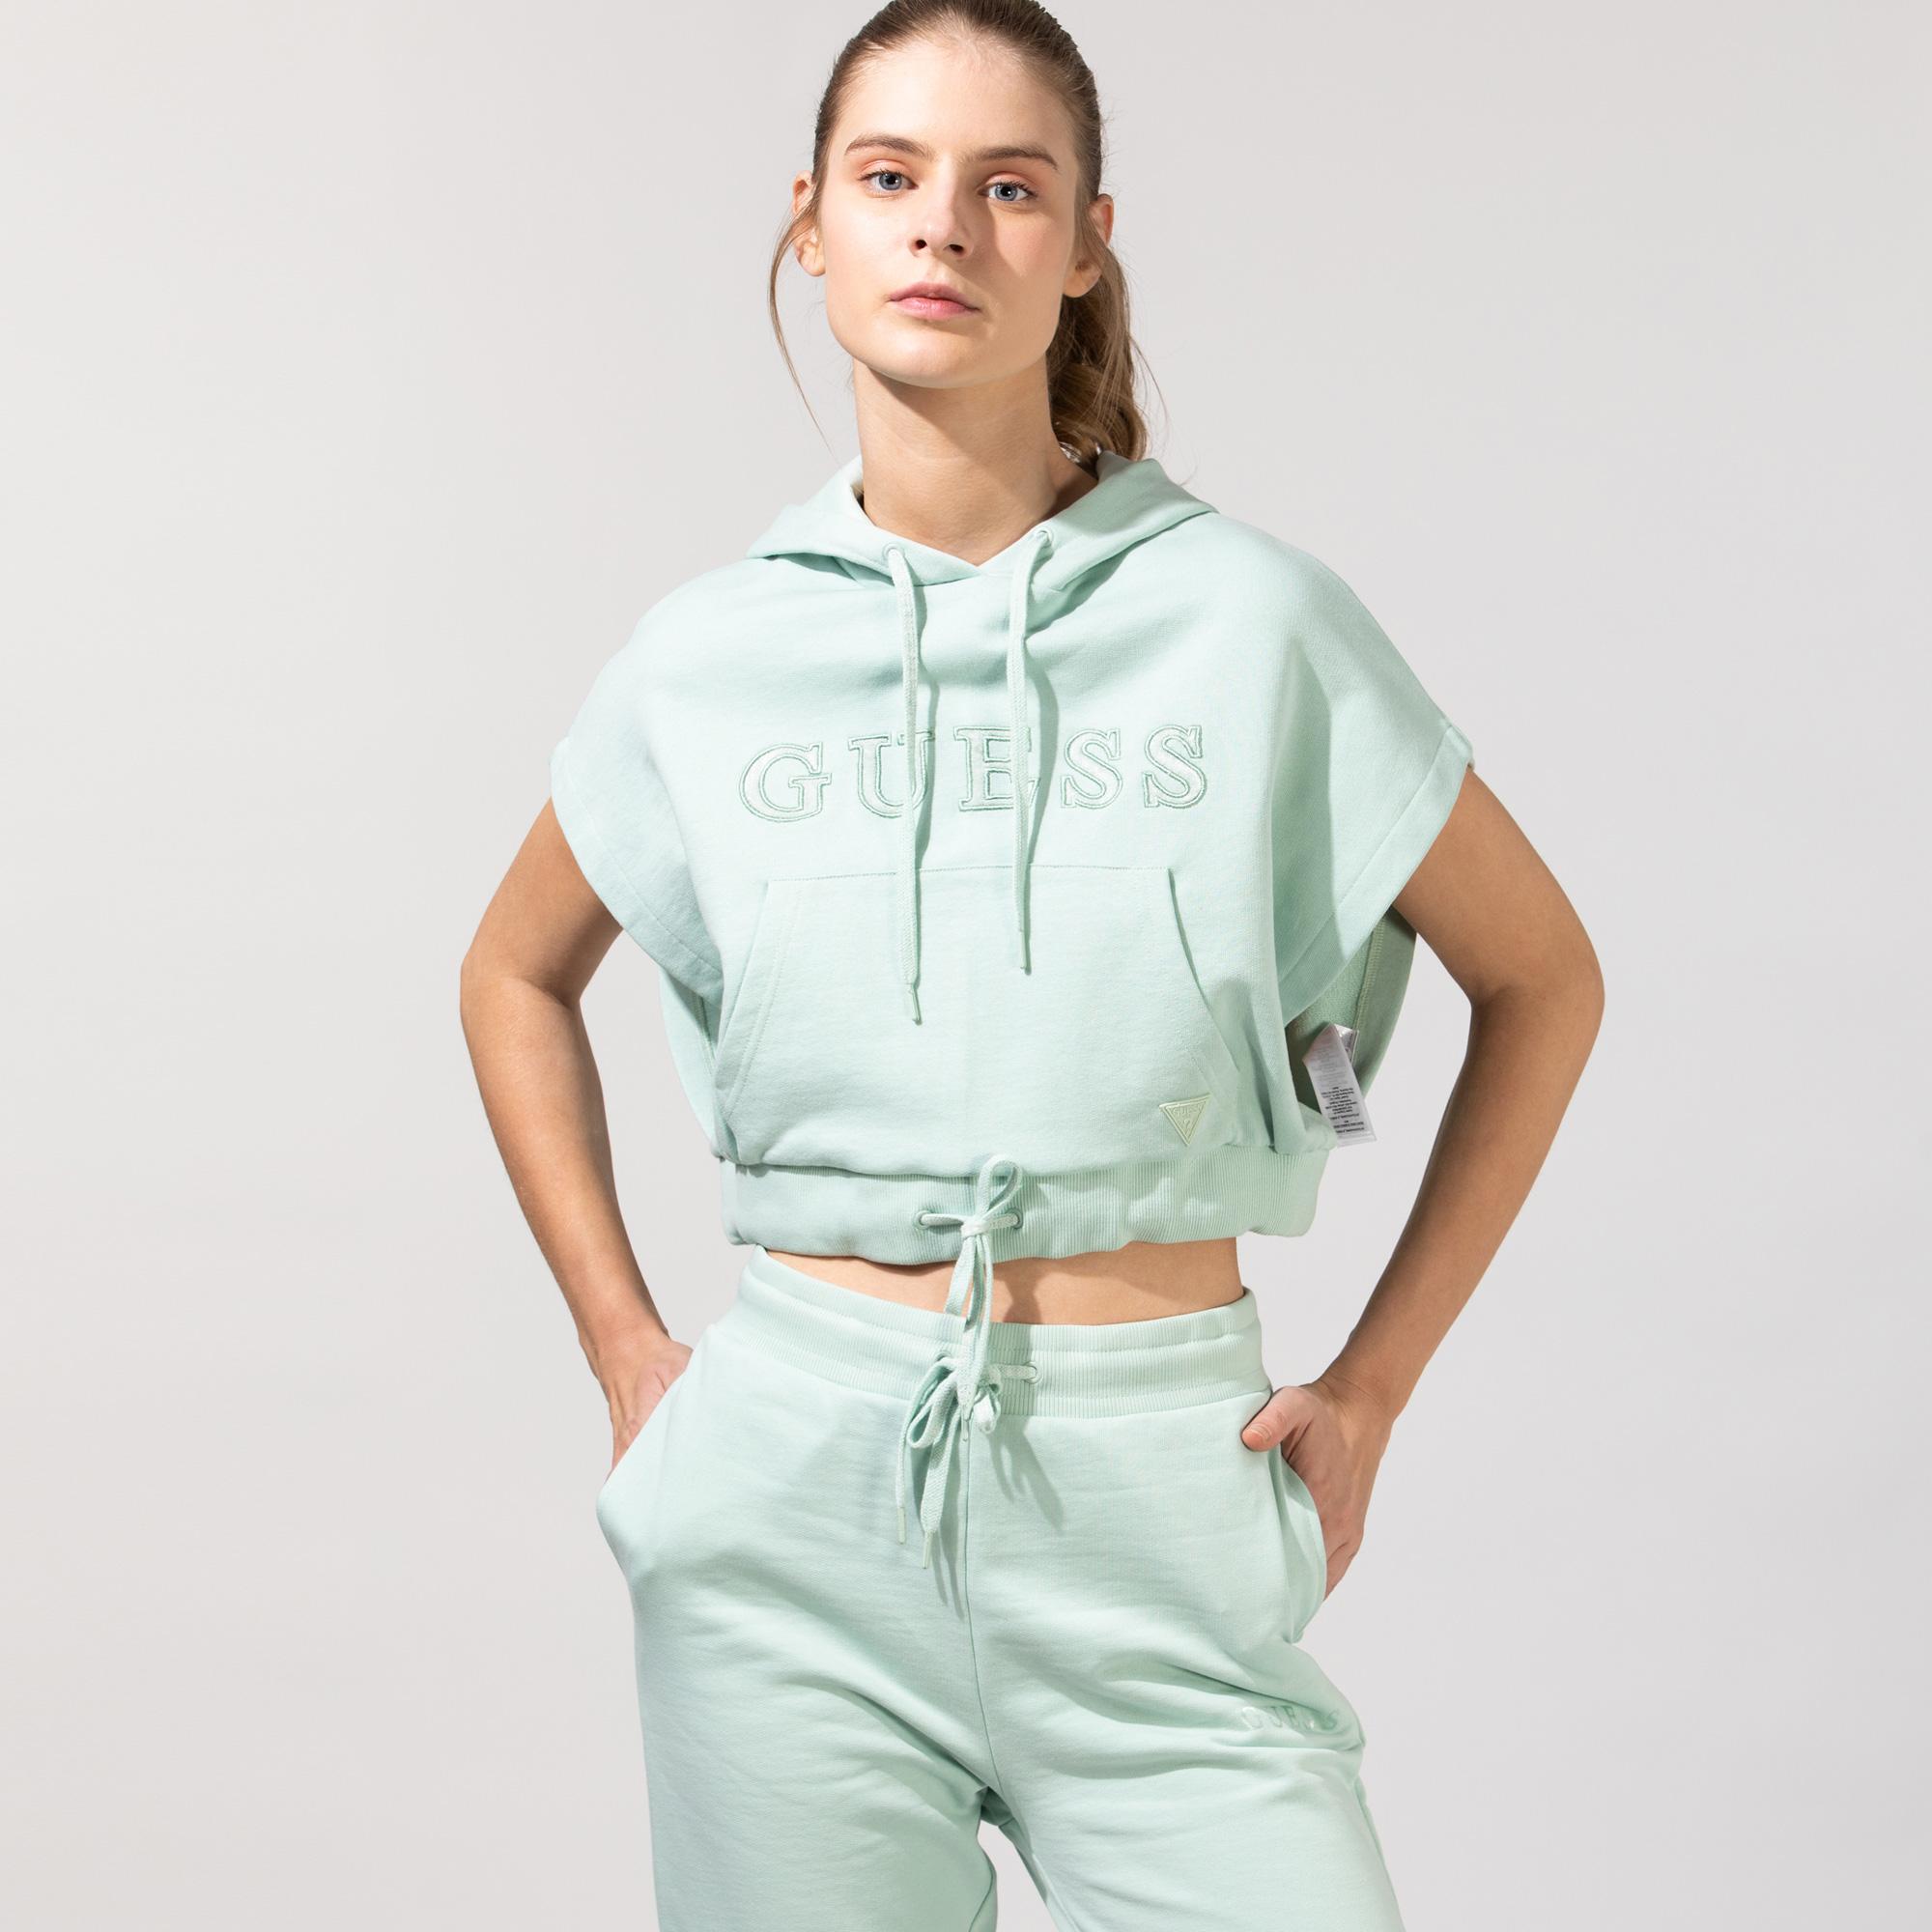 Guess Kadın Yeşil Sweatshirt